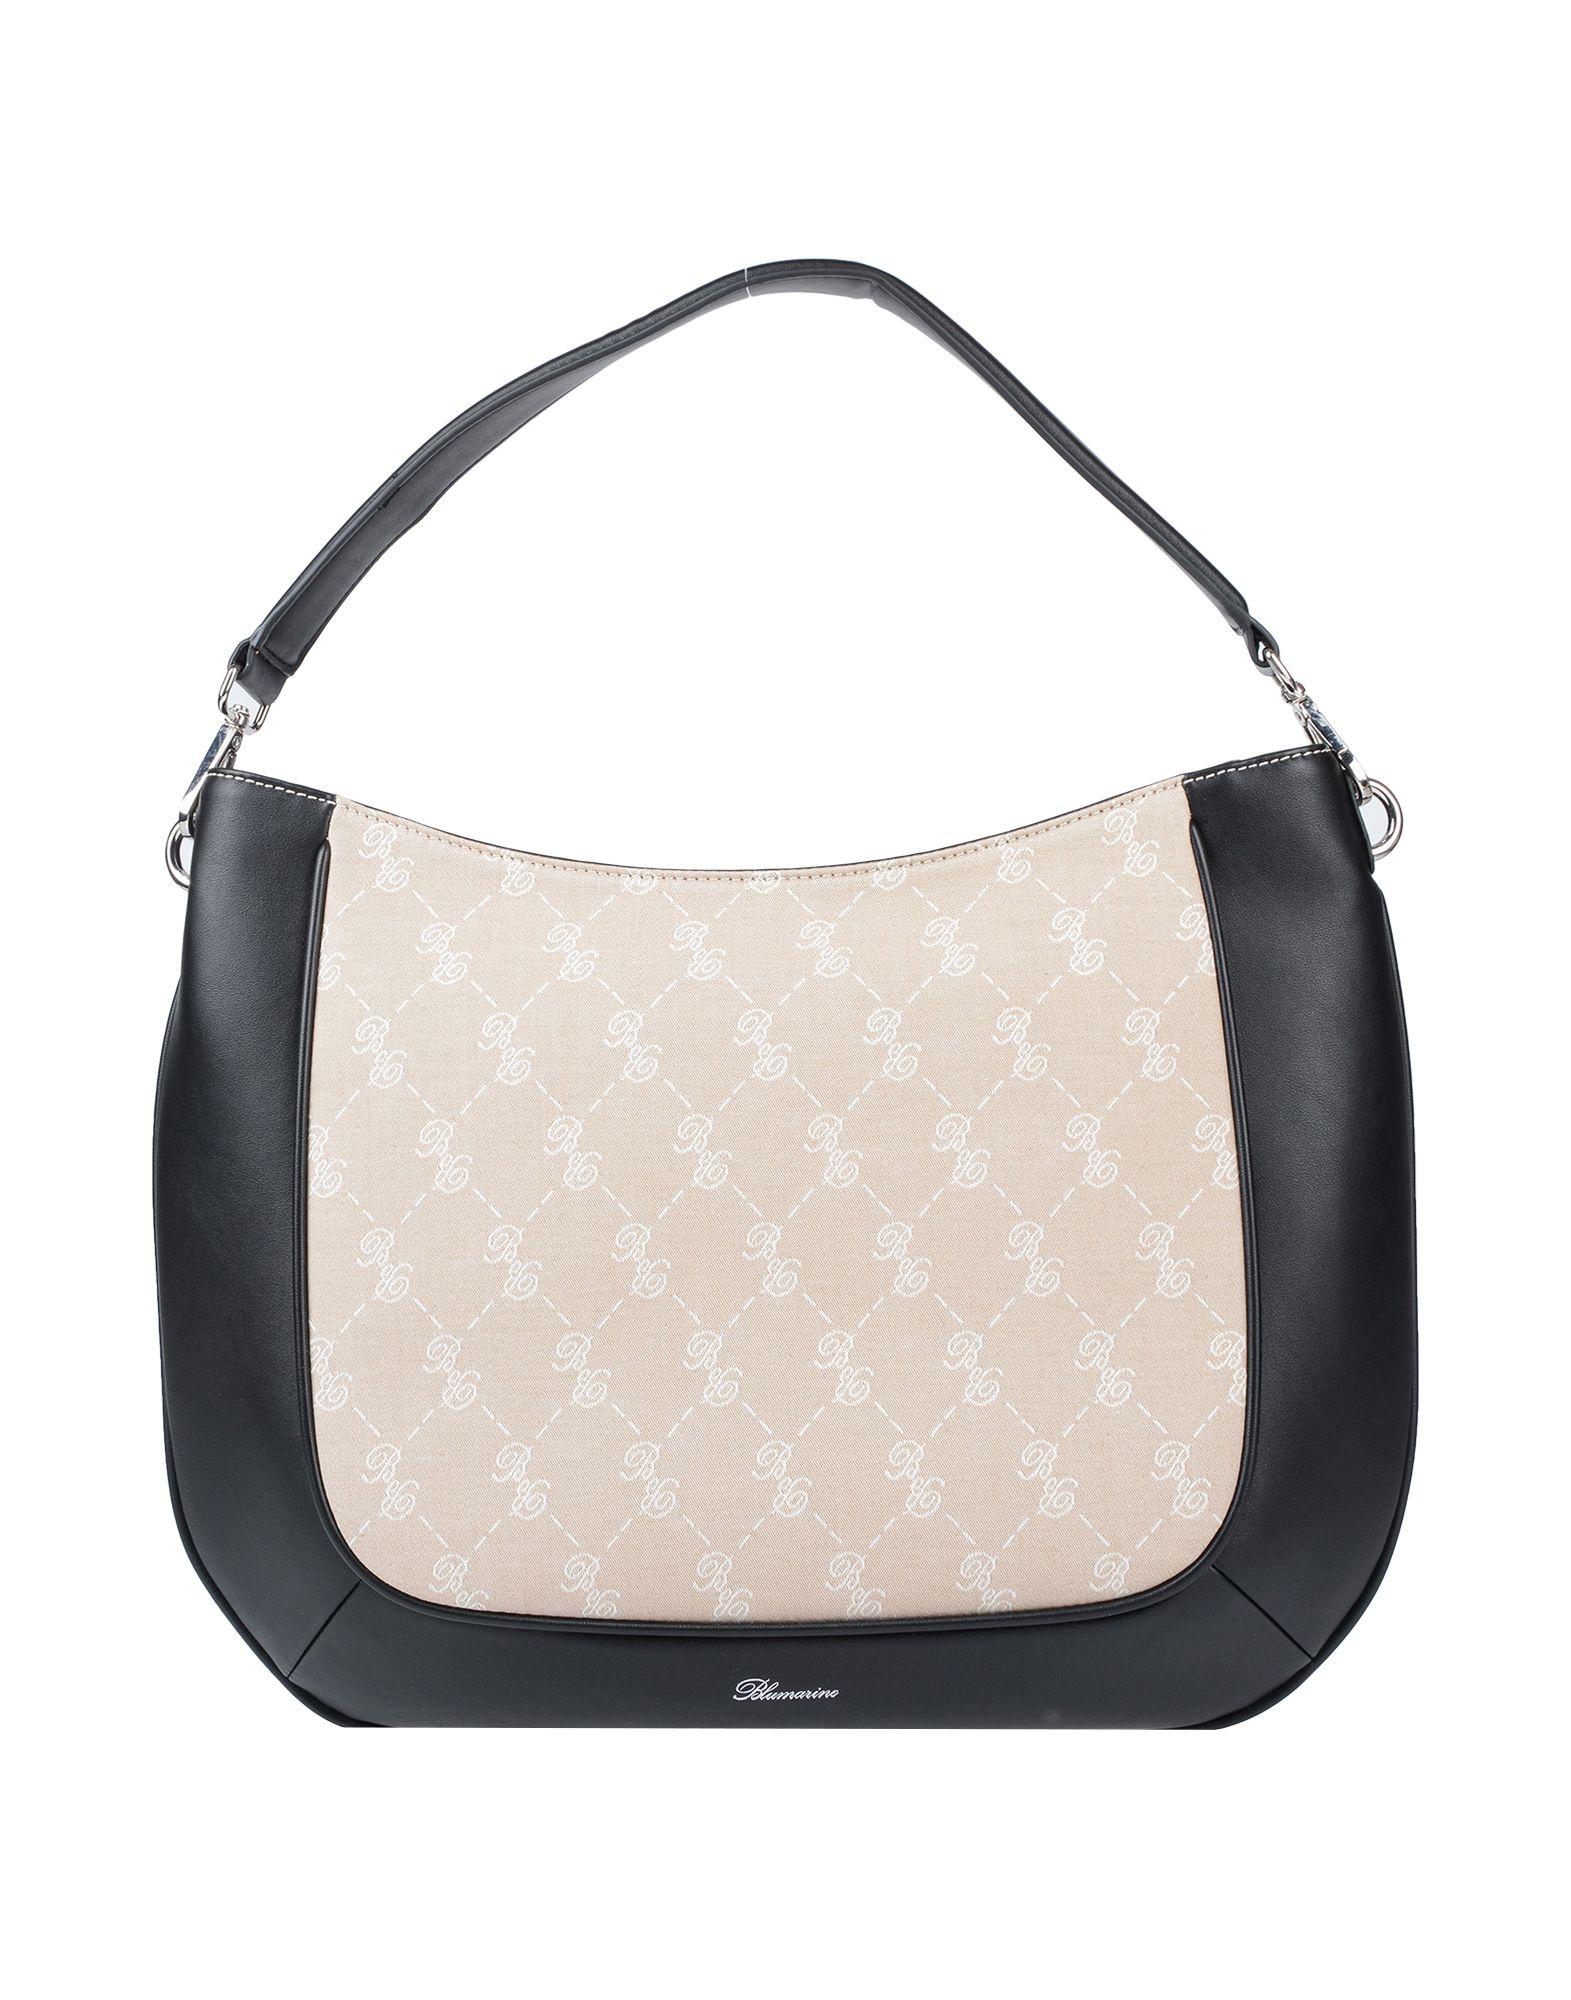 BLUMARINE Сумка на руку сумка хобо amo la vita jk 92bwc 005 искусственная кожа